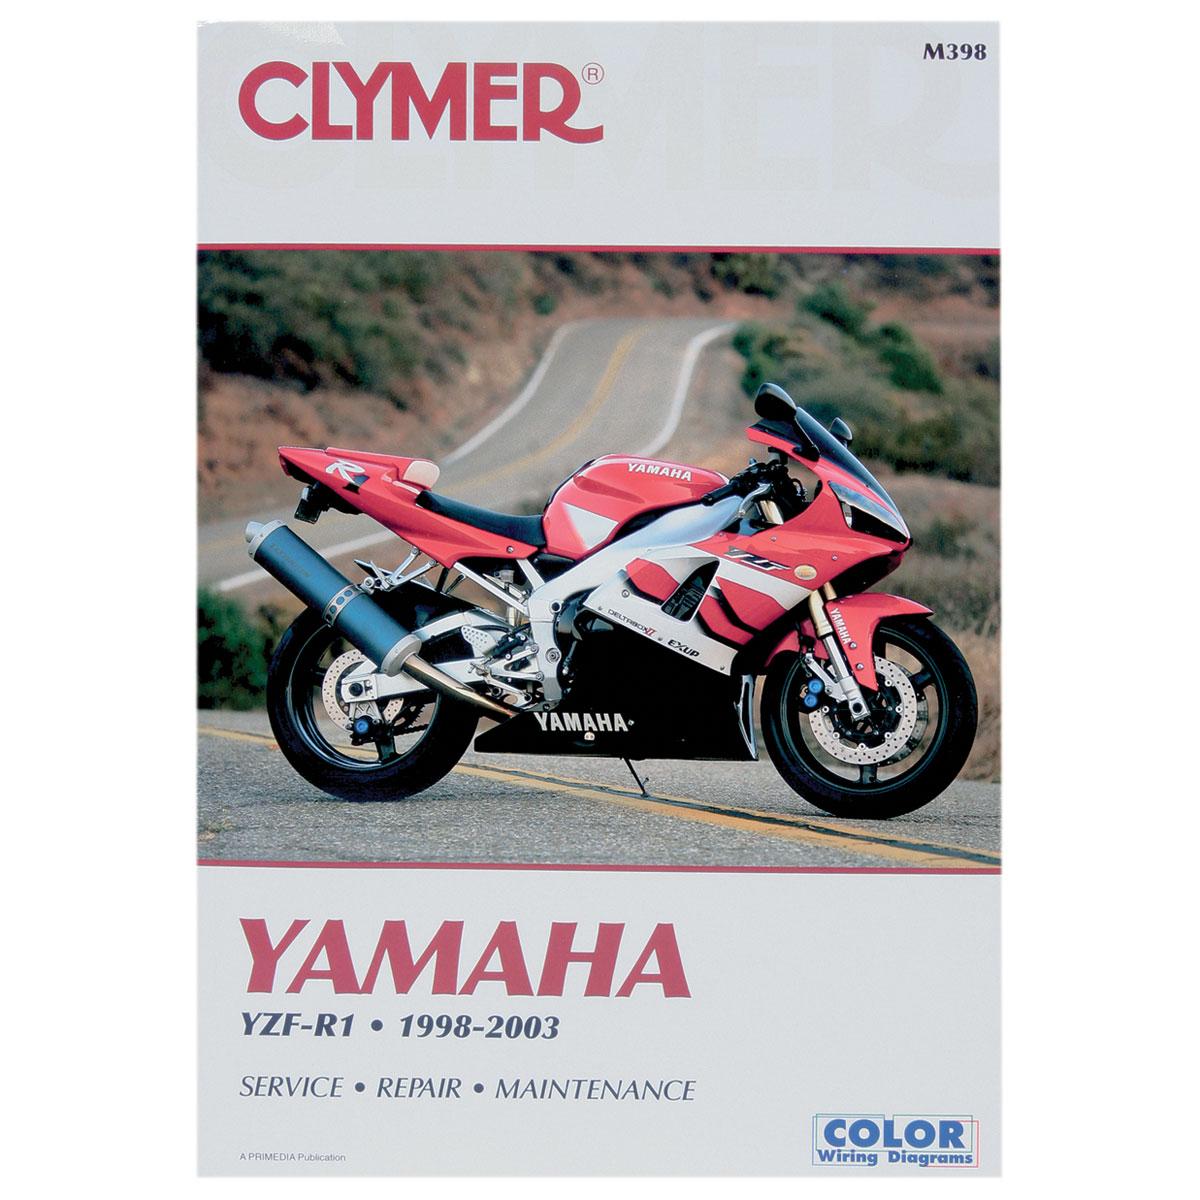 Clymer Yamaha Motorcycle Repair Manual